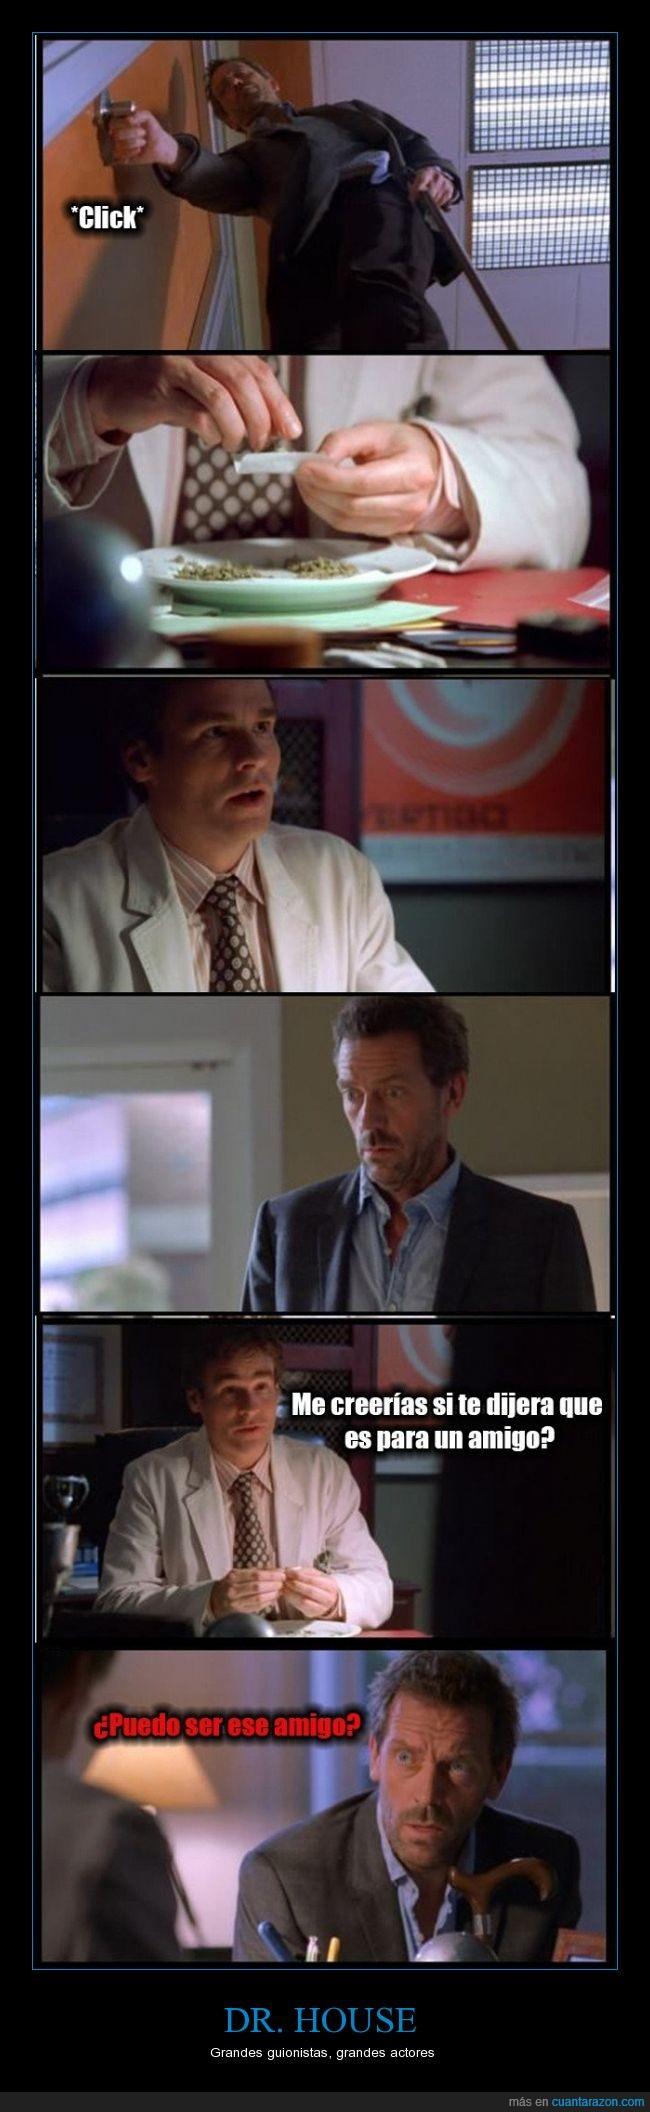 amigo,Dr. House,fumar,guardar,House,liar,puedo,ser,Wilson